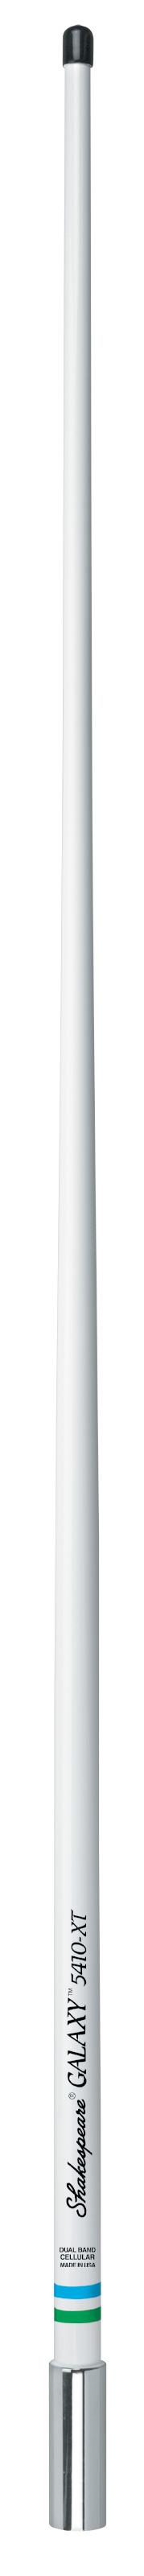 5410XT Cellular Marine Antenna